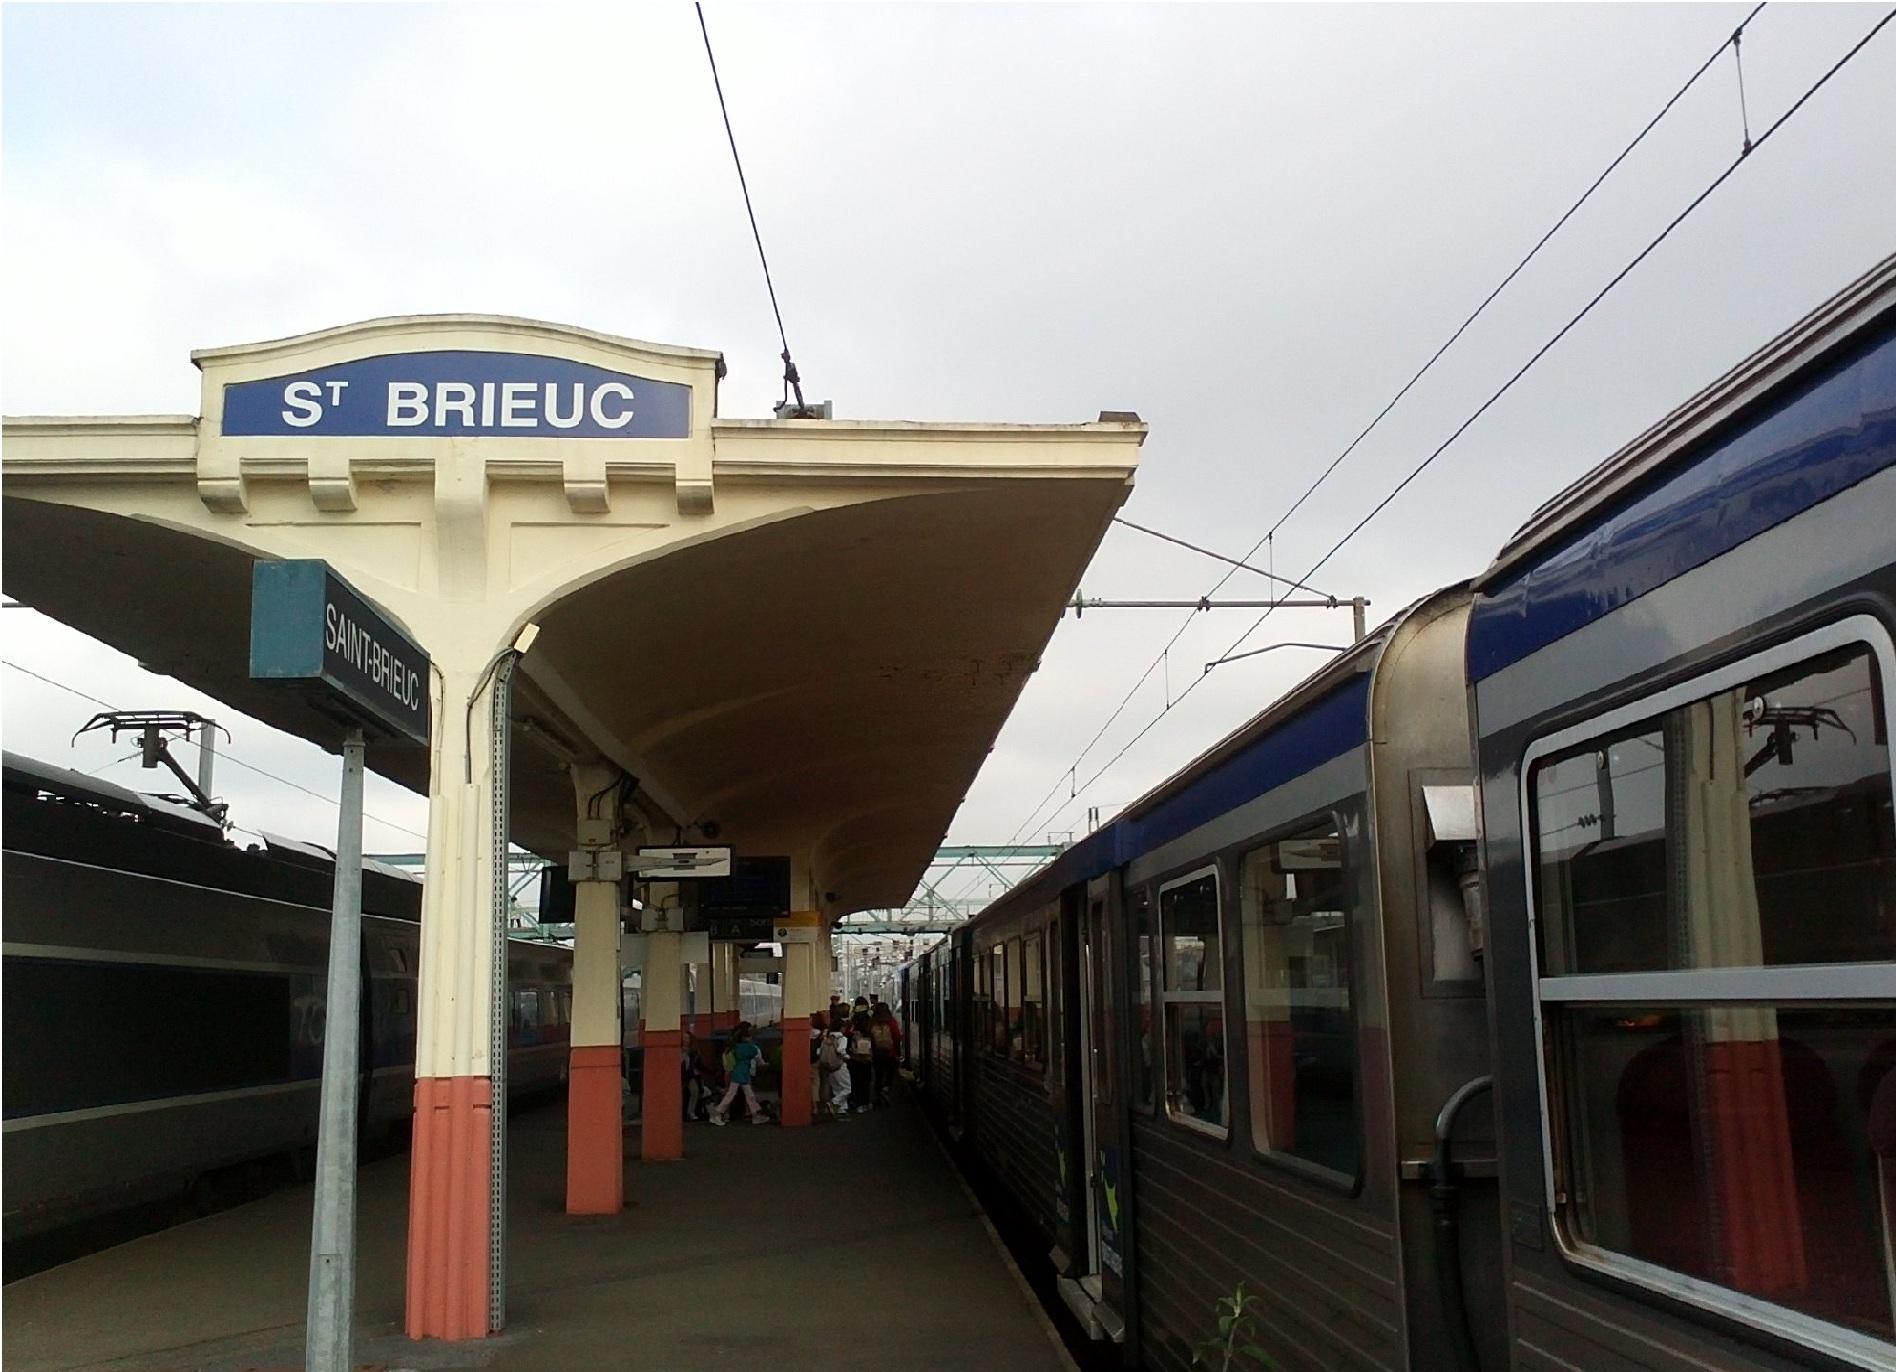 File:Gare de Saint-Brieuc-2013.jpg - Wikimedia Commons